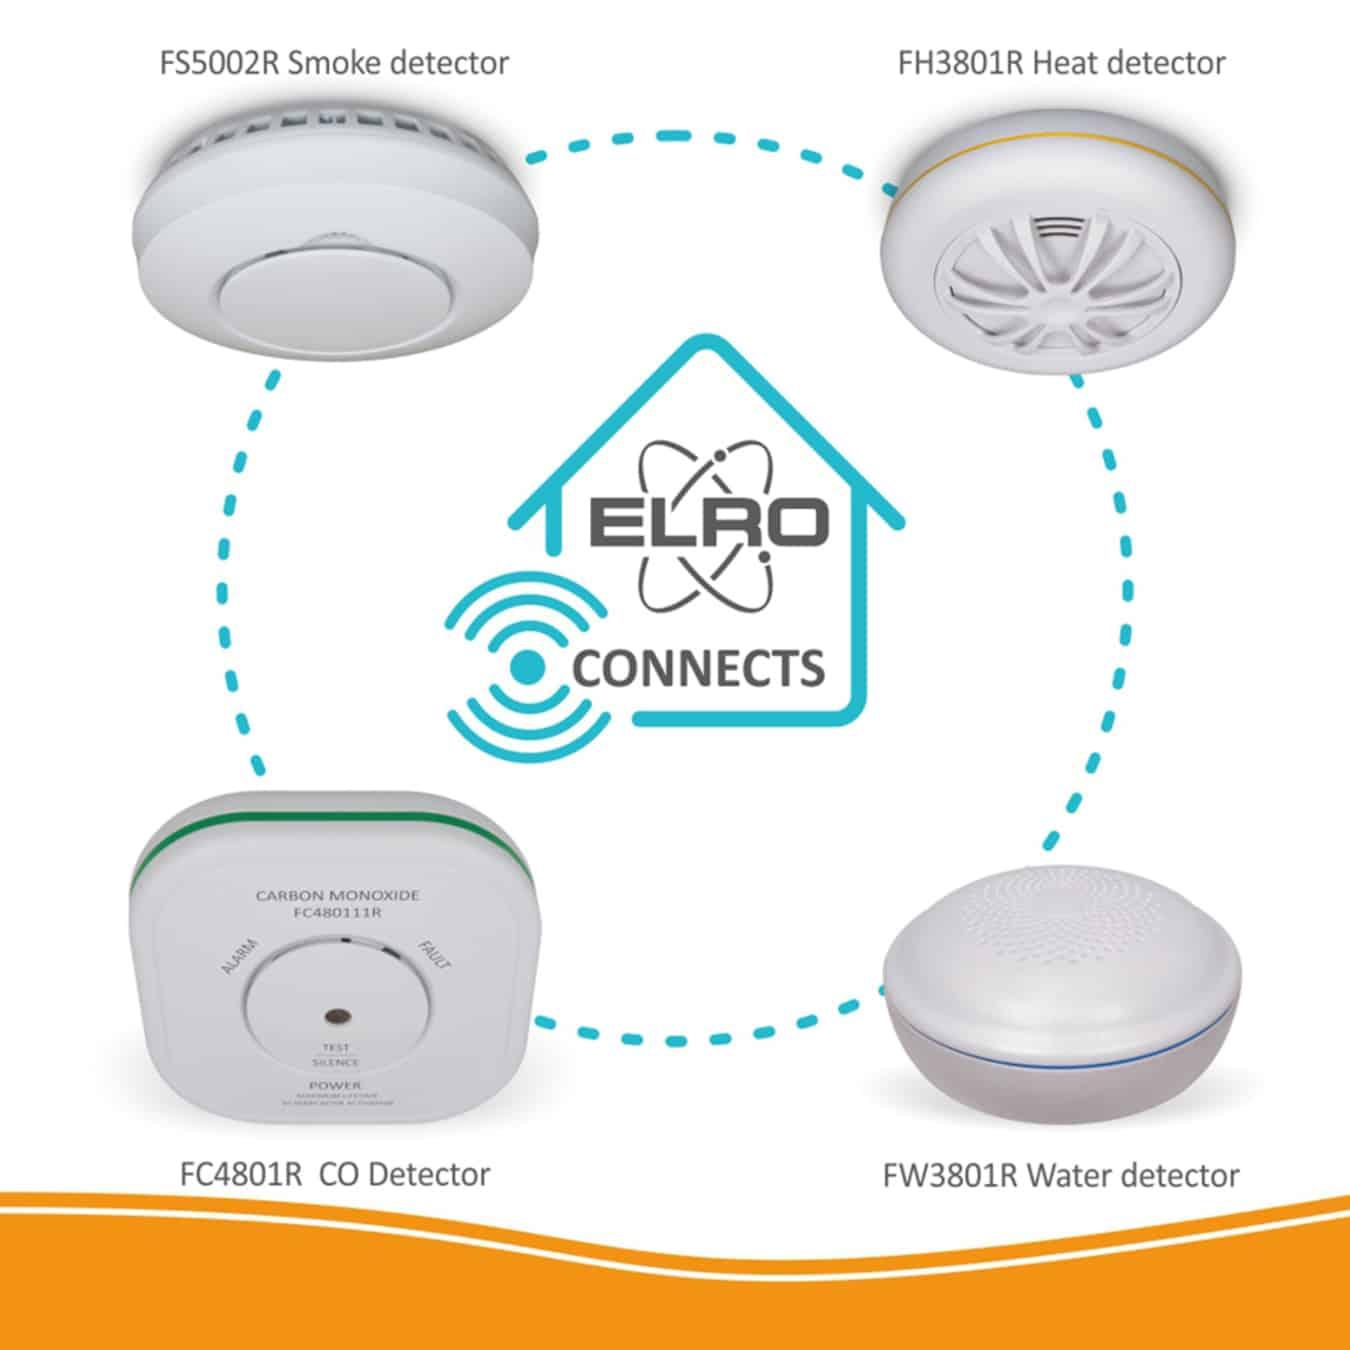 Koop ELRO Connects FC480111R Koolmonoxidemelder draadloos koppelbaar